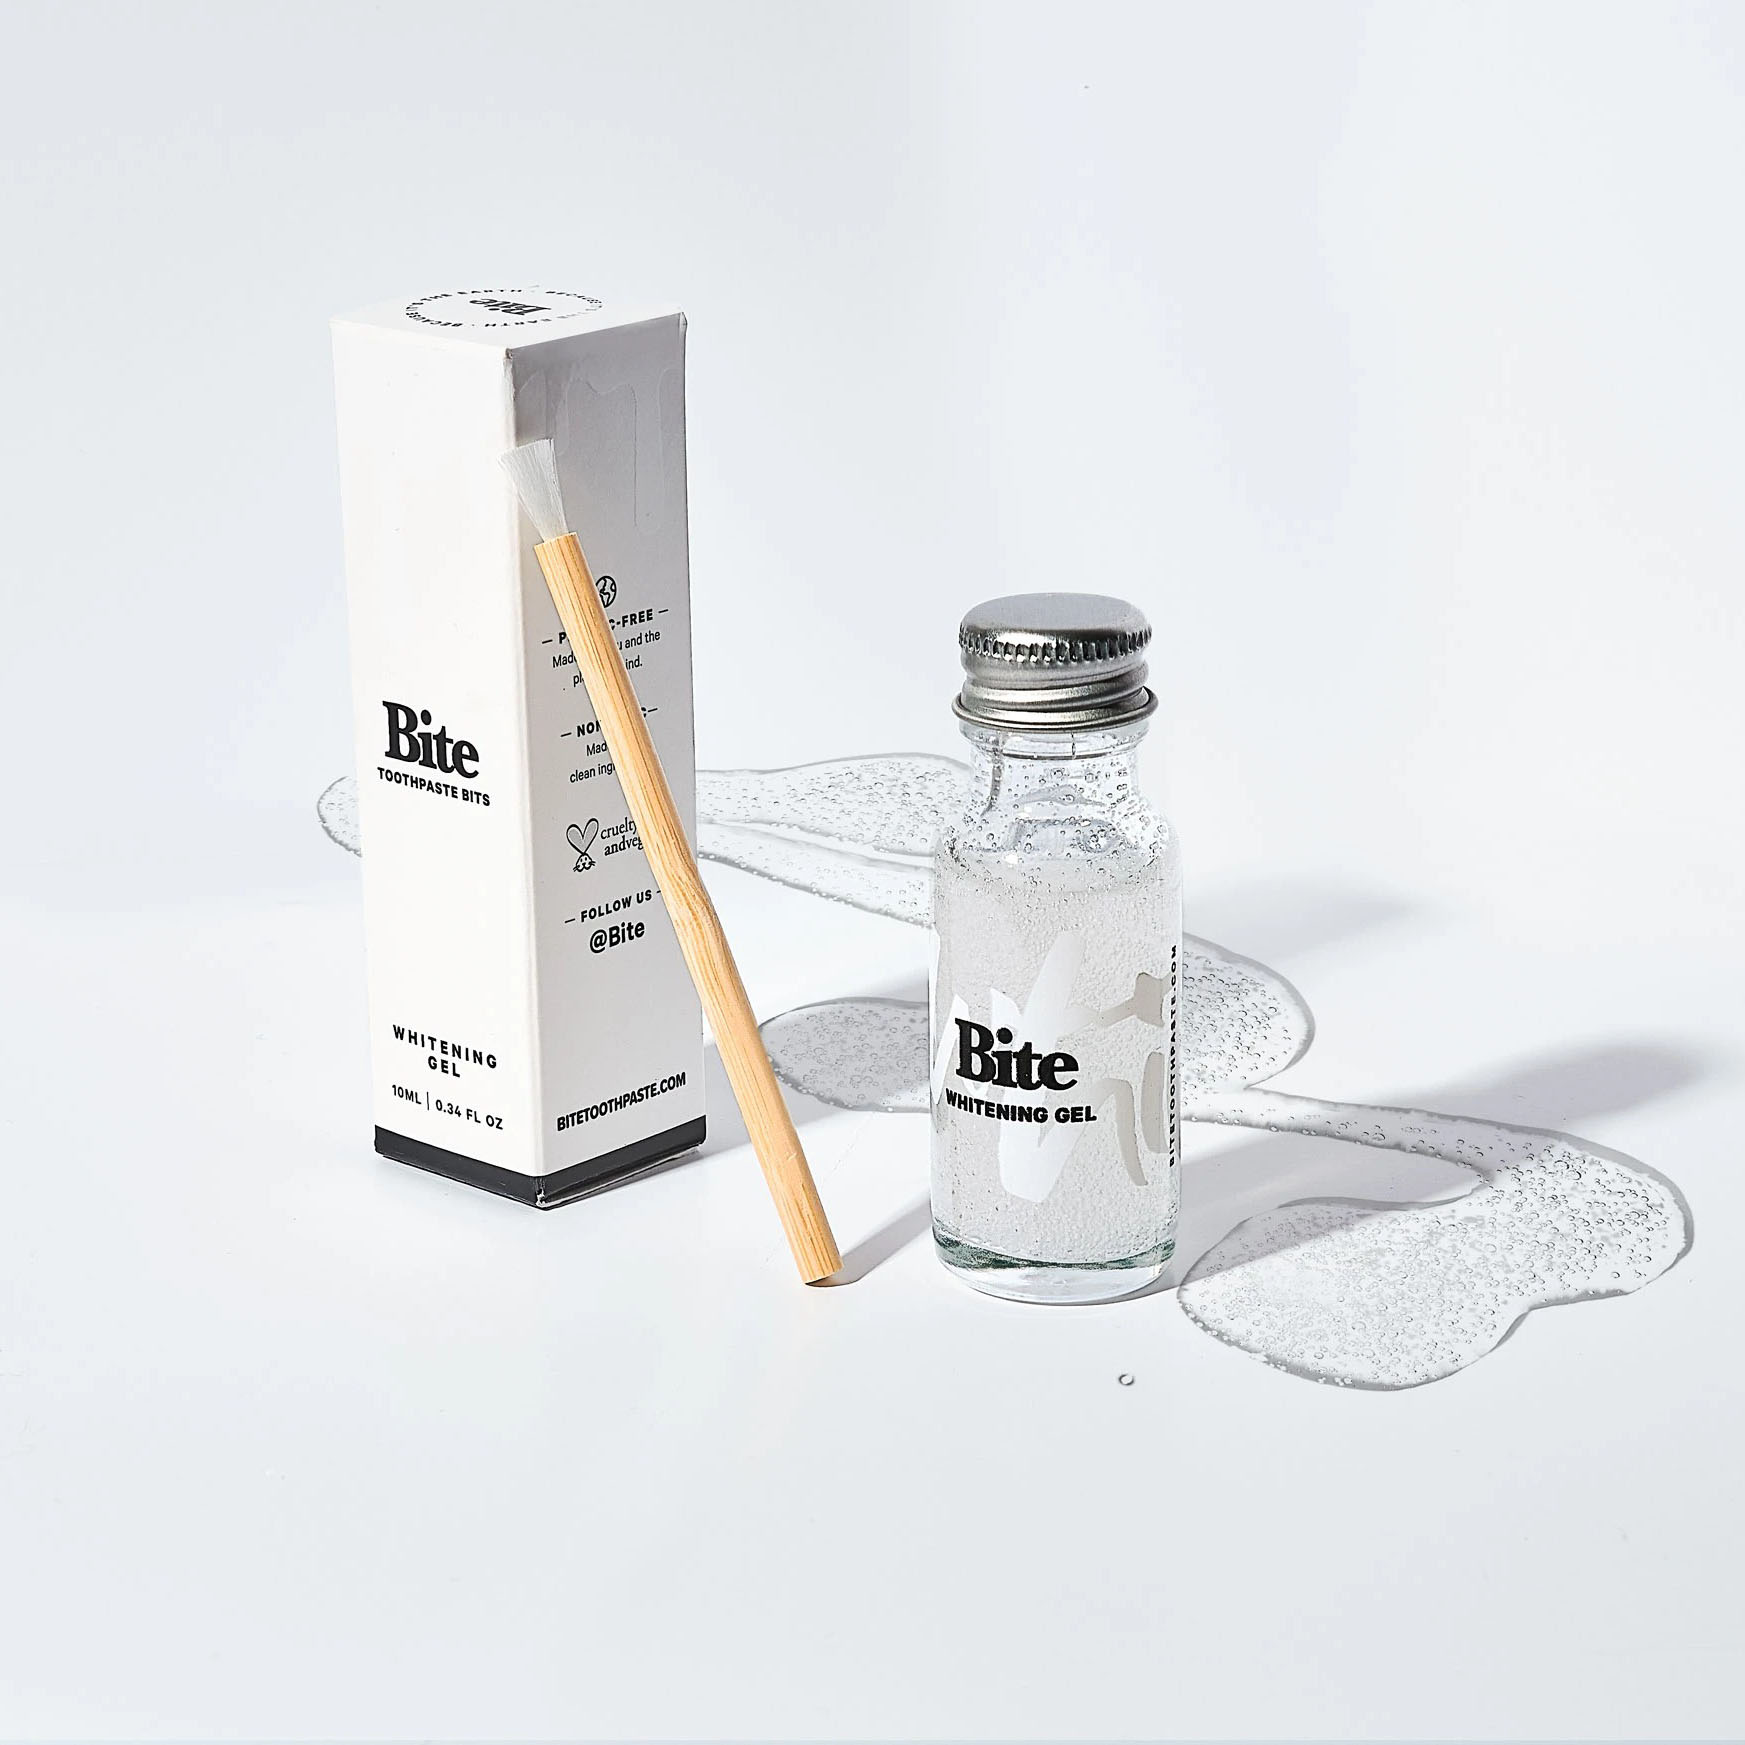 Bite Toothpaste Whitening Gel, best teeth whitening products